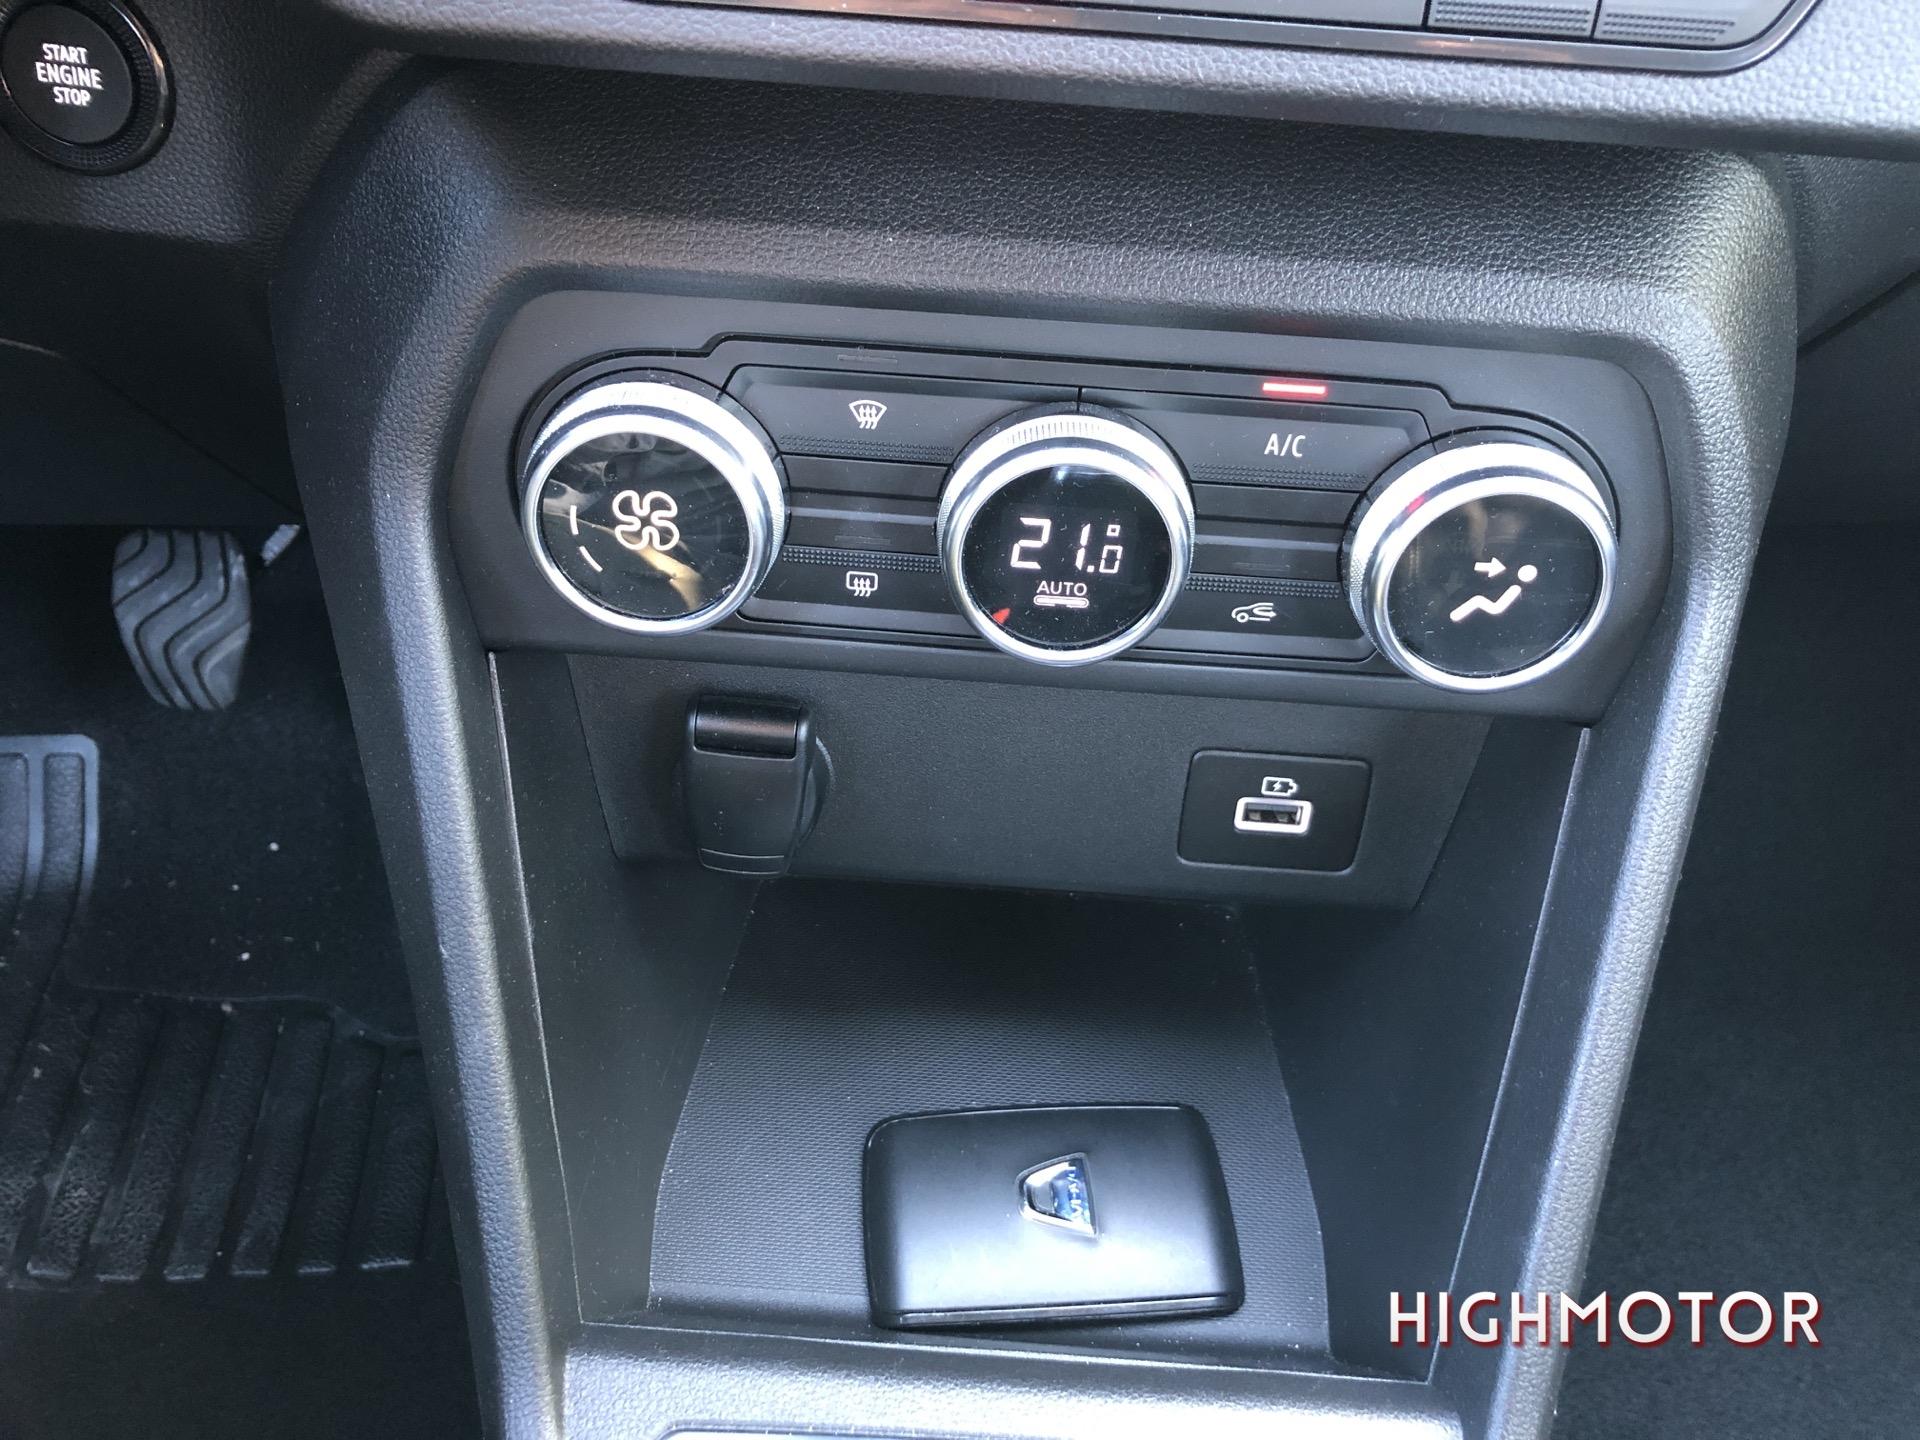 Dacia Sandero Glp 16